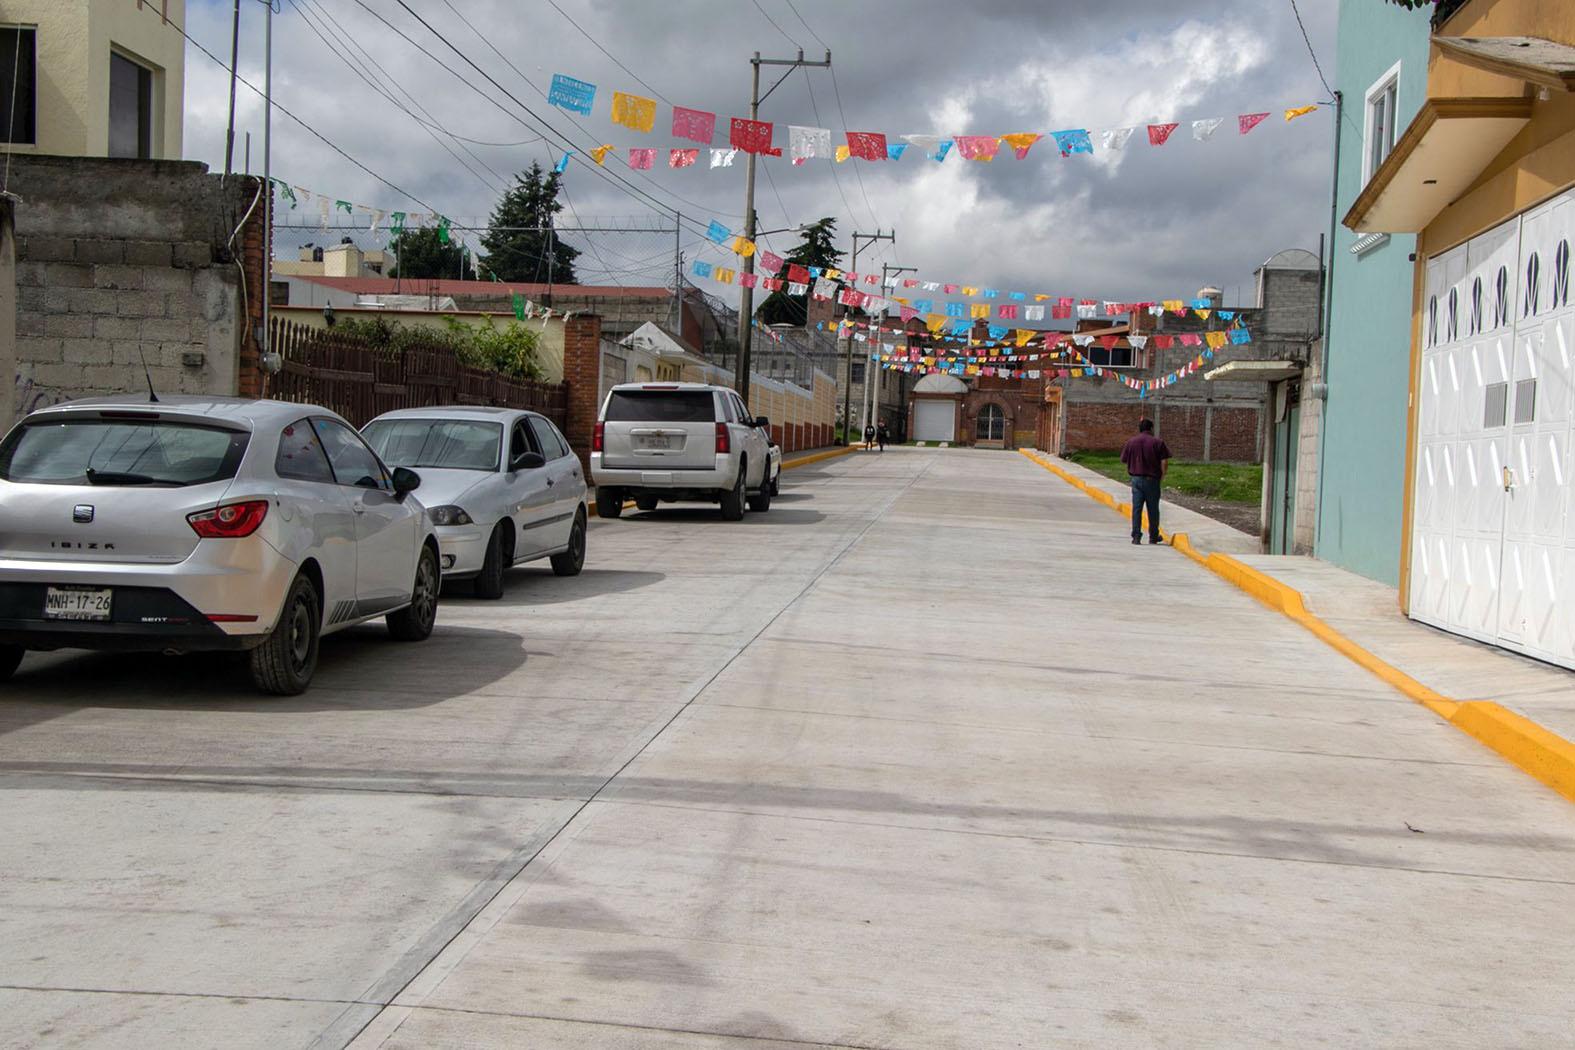 https://0201.nccdn.net/4_2/000/000/019/c2c/calles-b-4-1575x1050.jpg